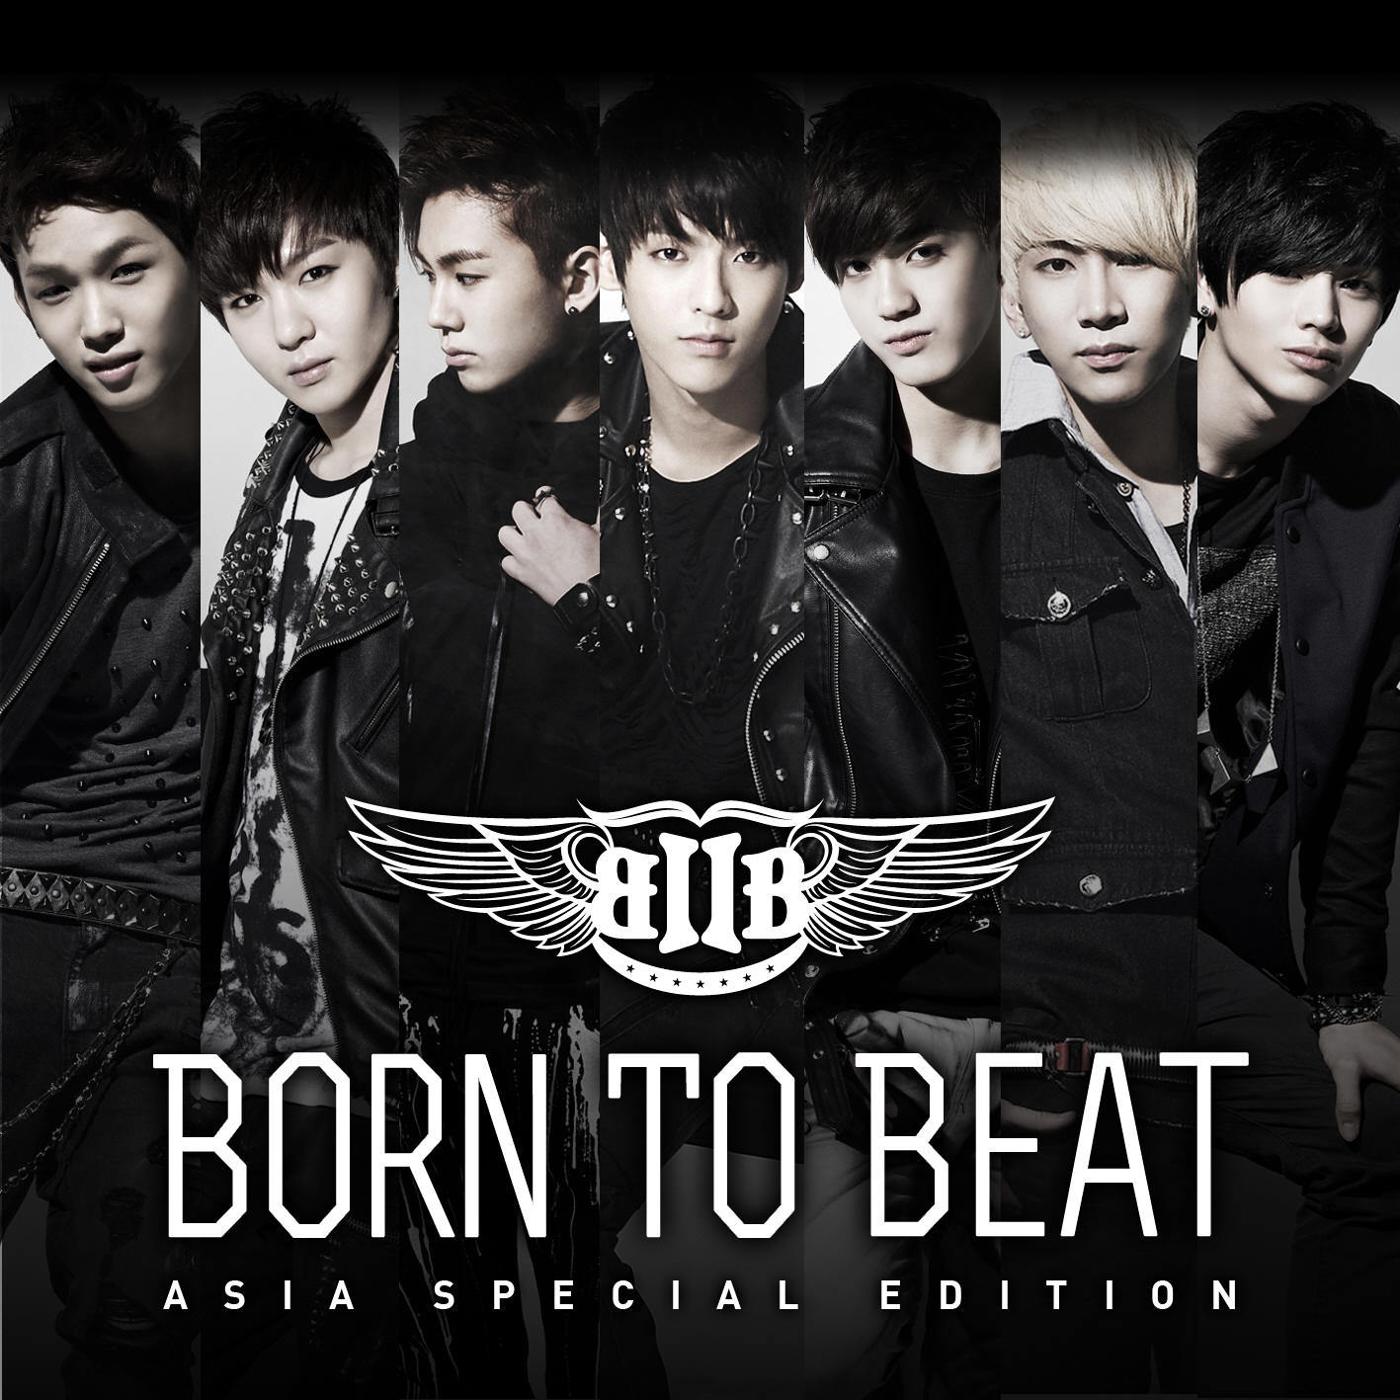 Born to Beat